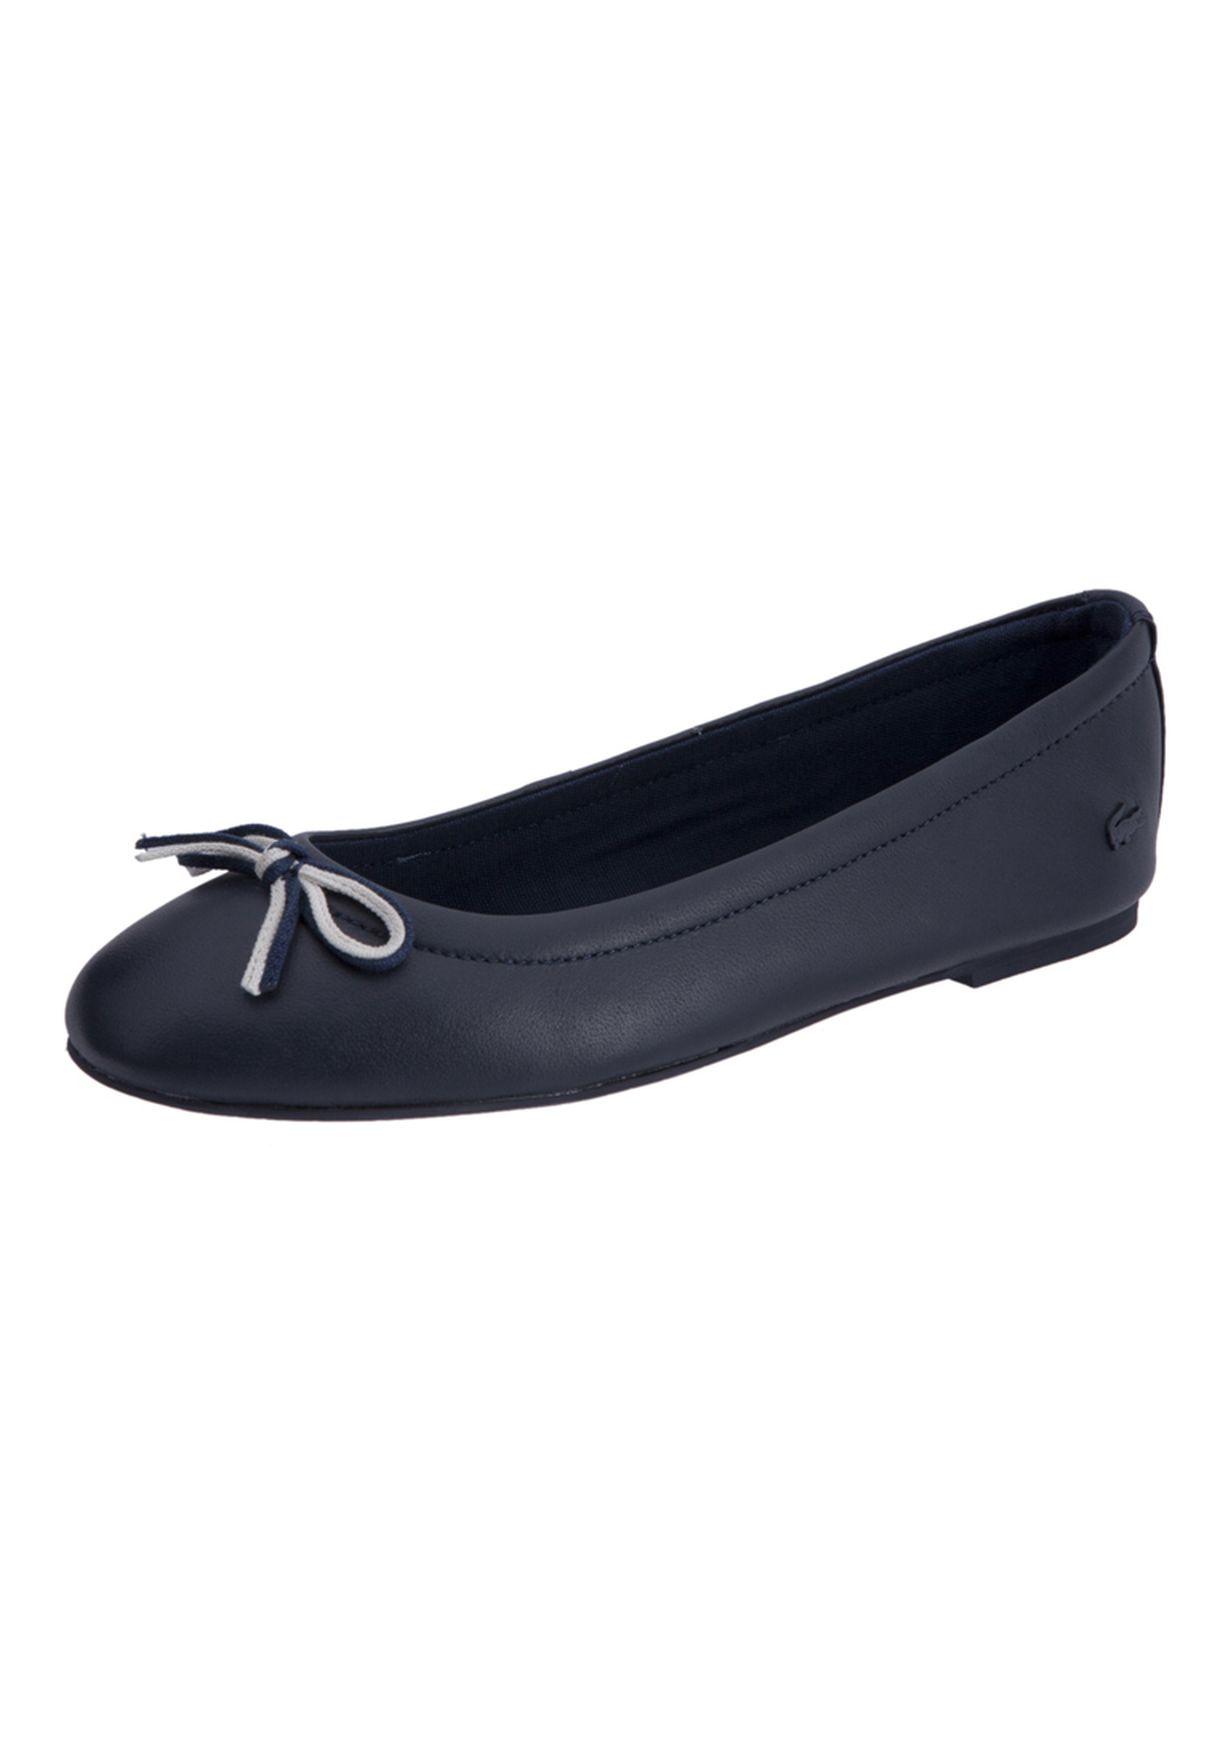 Shop Lacoste black Casual Ballerina Shoes 23srw1024-38f for Women in Kuwait  - LA014SH13XNA 364af832274